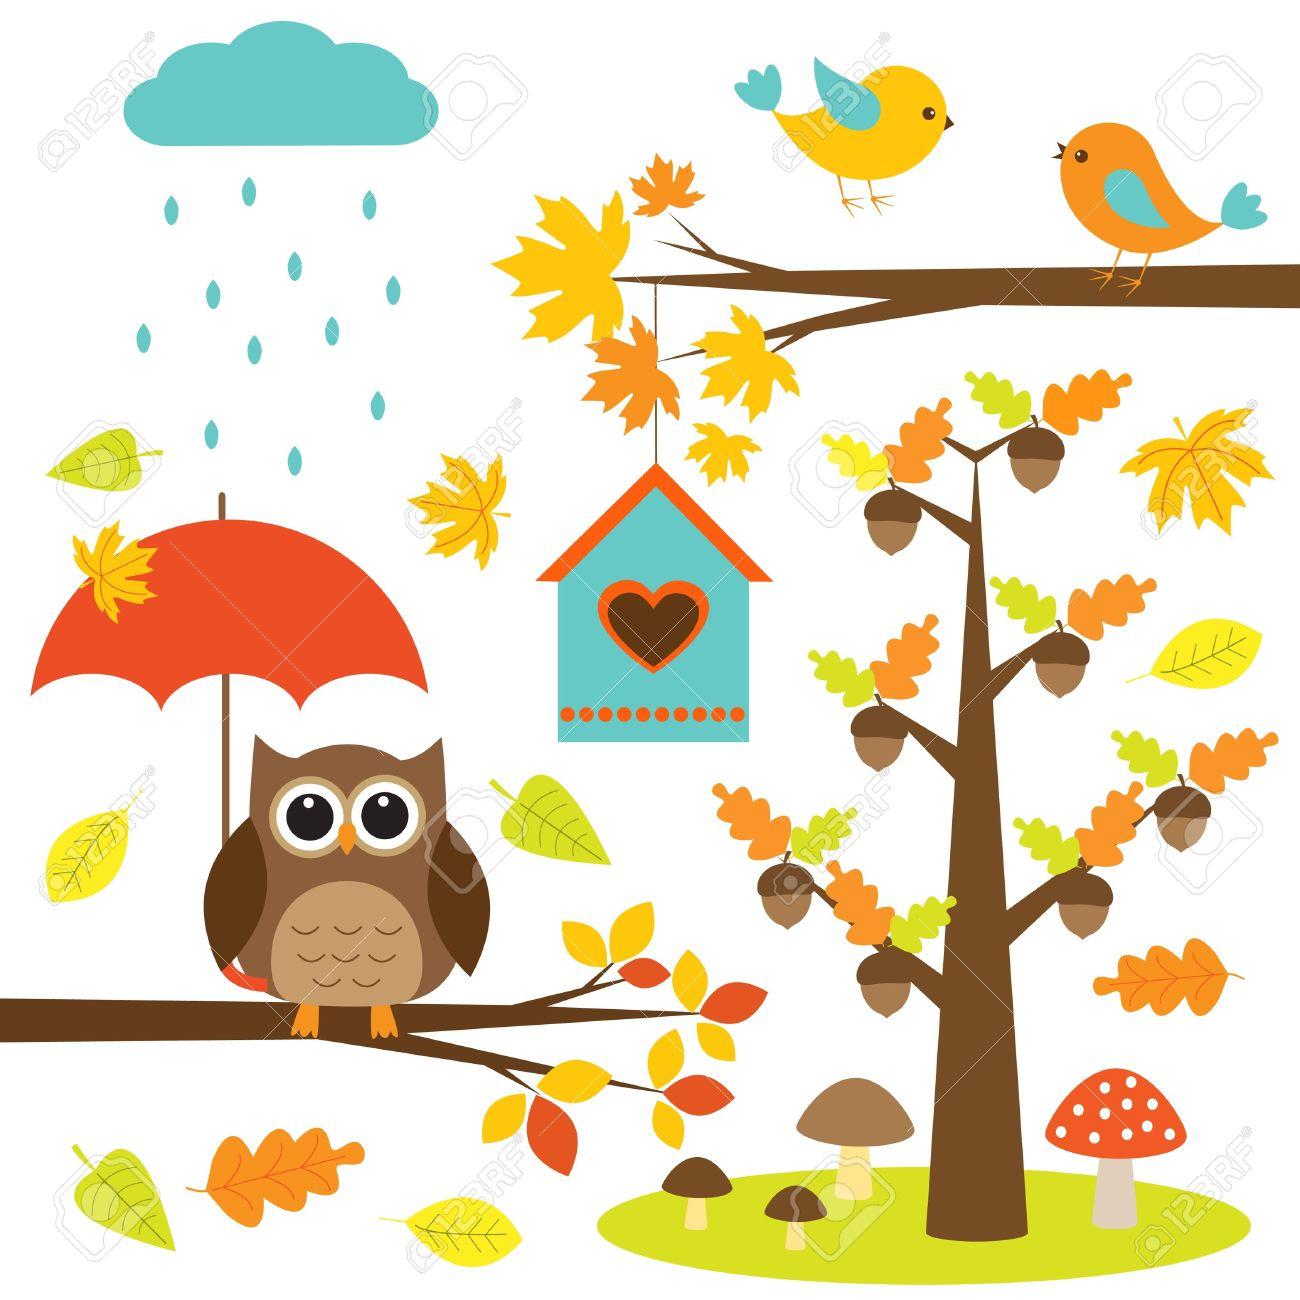 Image of birdhouse clipart 1 clip art clipartoons 2